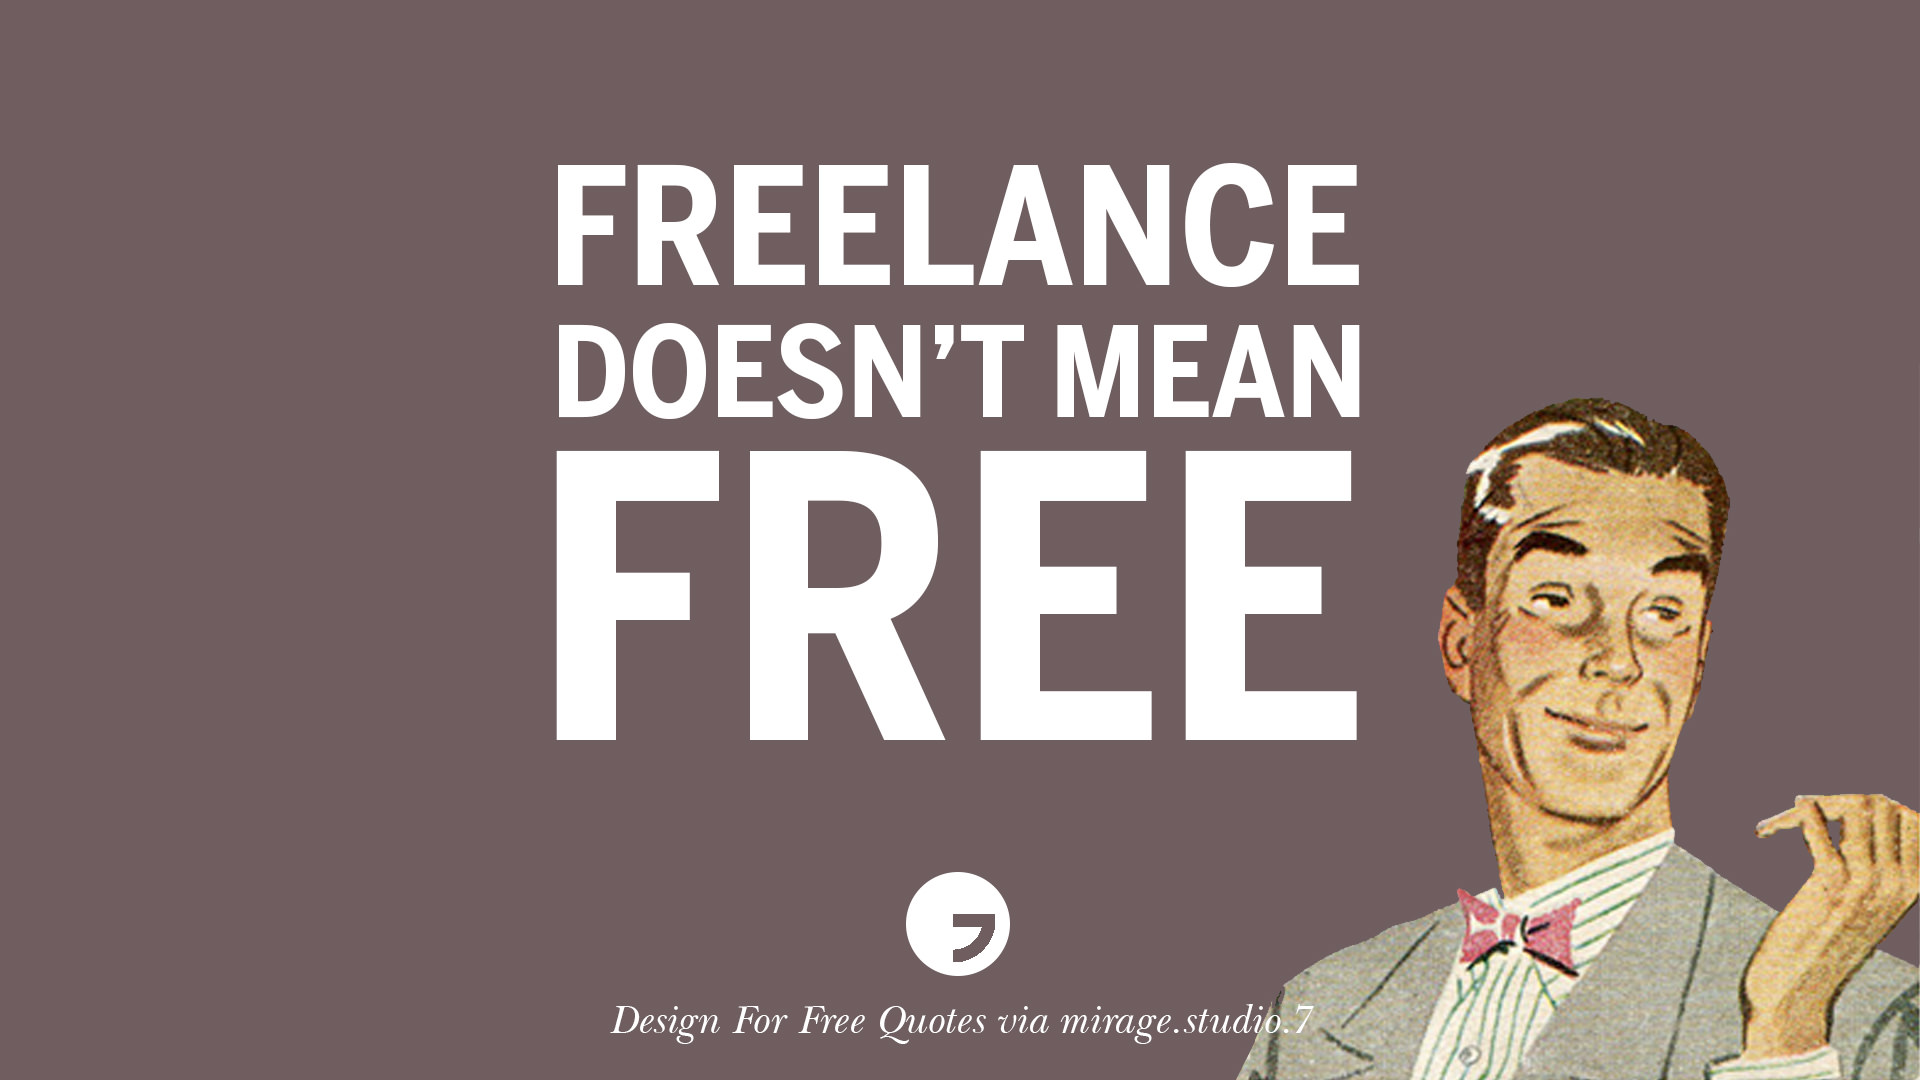 Sarcastic Quotes: 10 Sarcastic 'Design For Free' Quotes For Interior